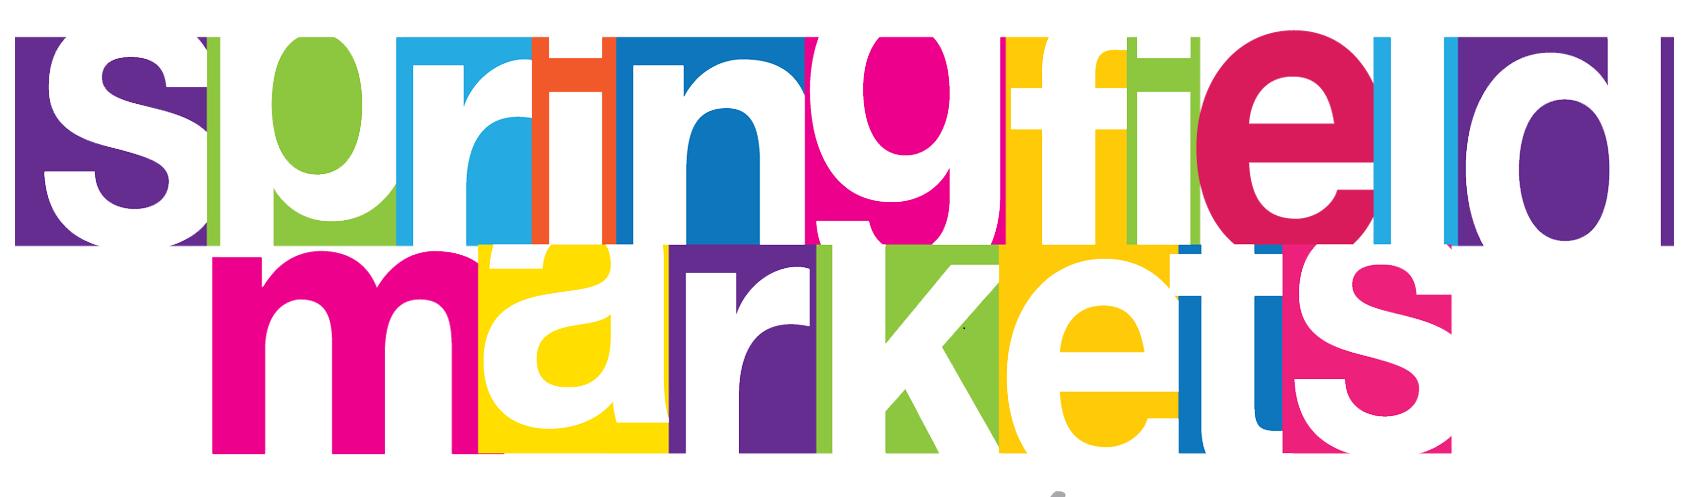 Springfield Markets | Stallholder Application | Sunday 7th March 2021